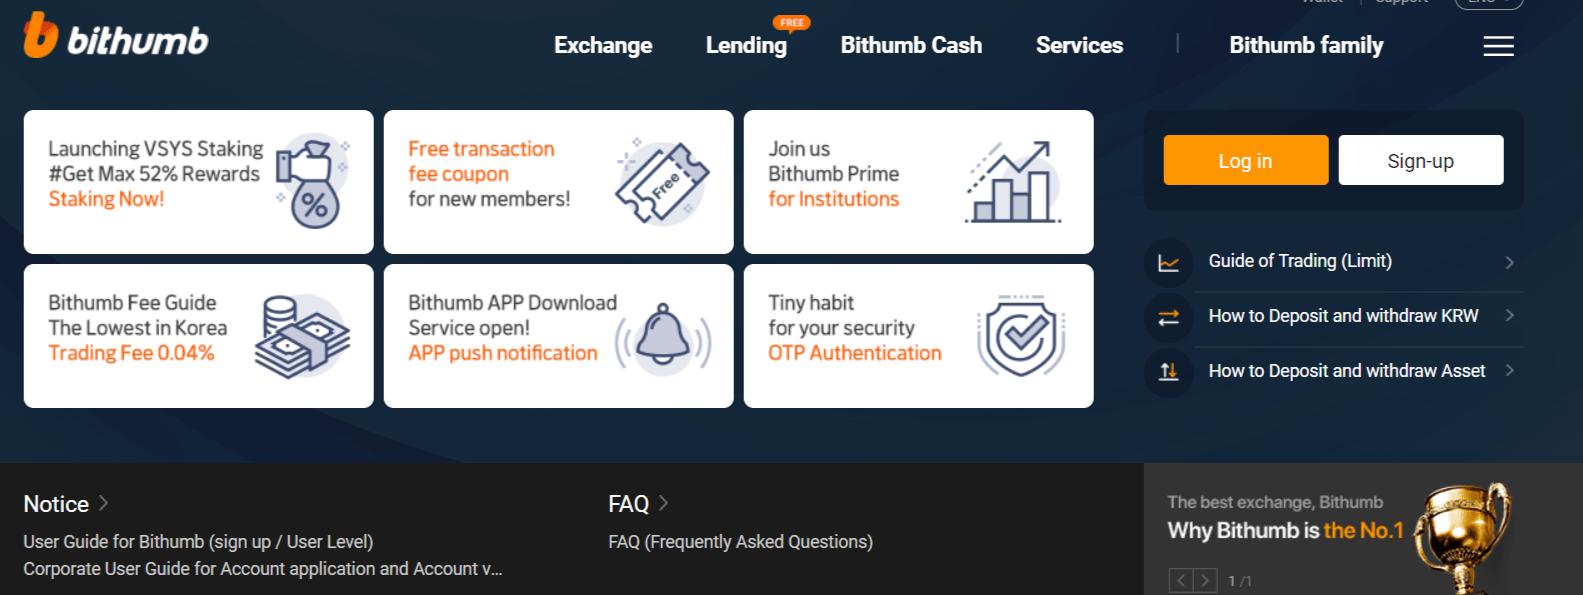 Bithumb Cryptocurrency Exchange Review - No.1 Digital Asset Platform